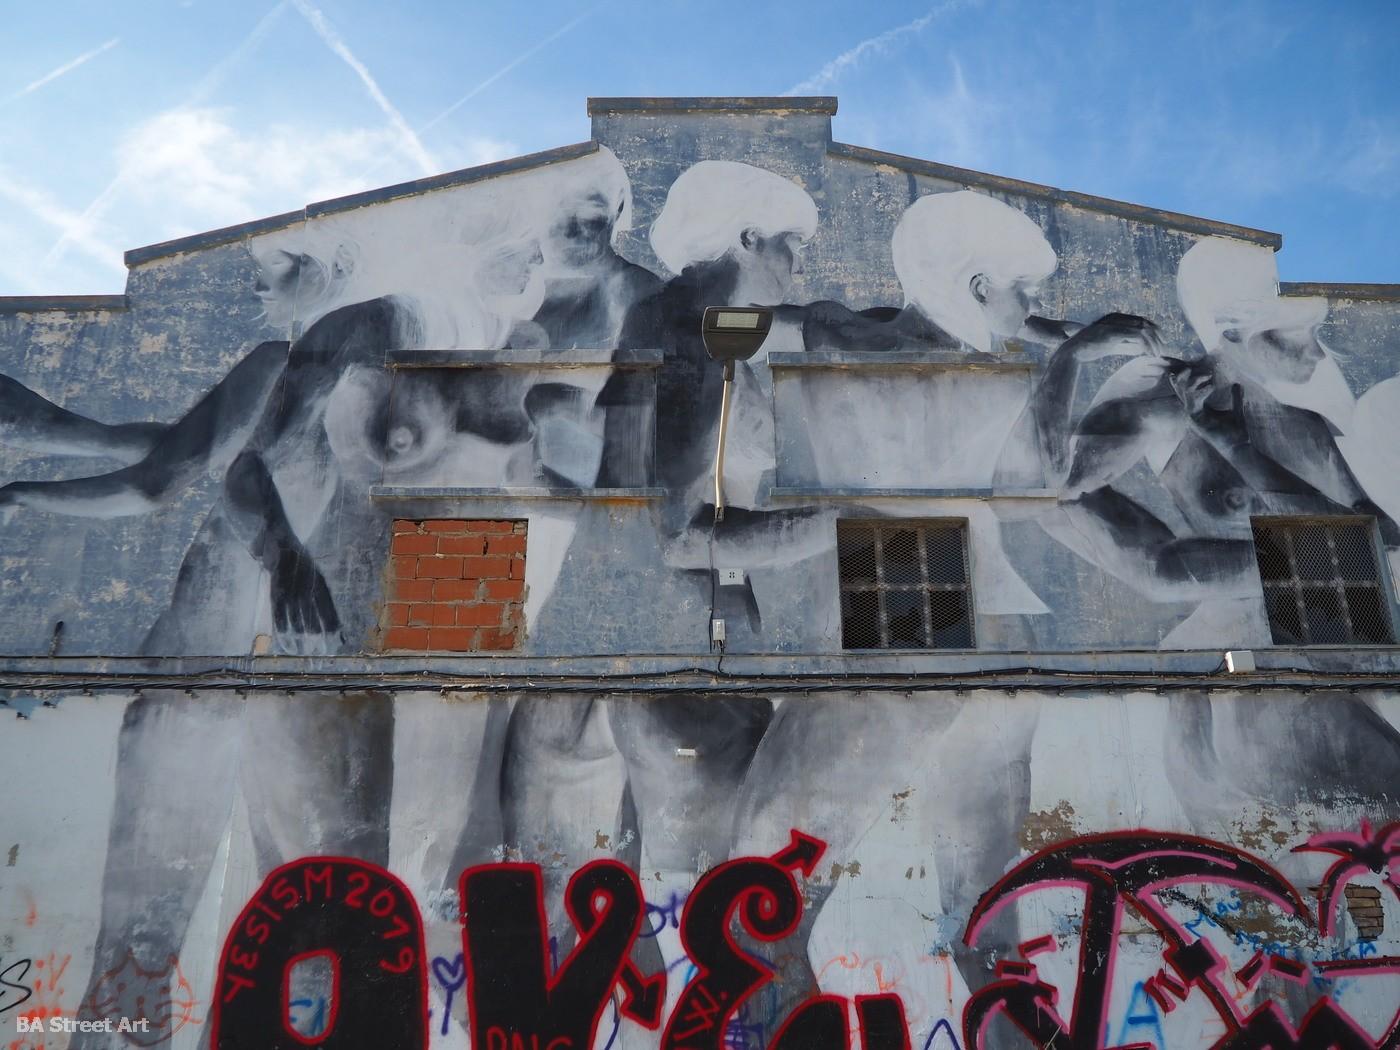 Francisco Bosoletti muralista artista argentino artist mural valencia el cabanyal figuras retratos barrio españa arte urbano buenosairesstreetart.com